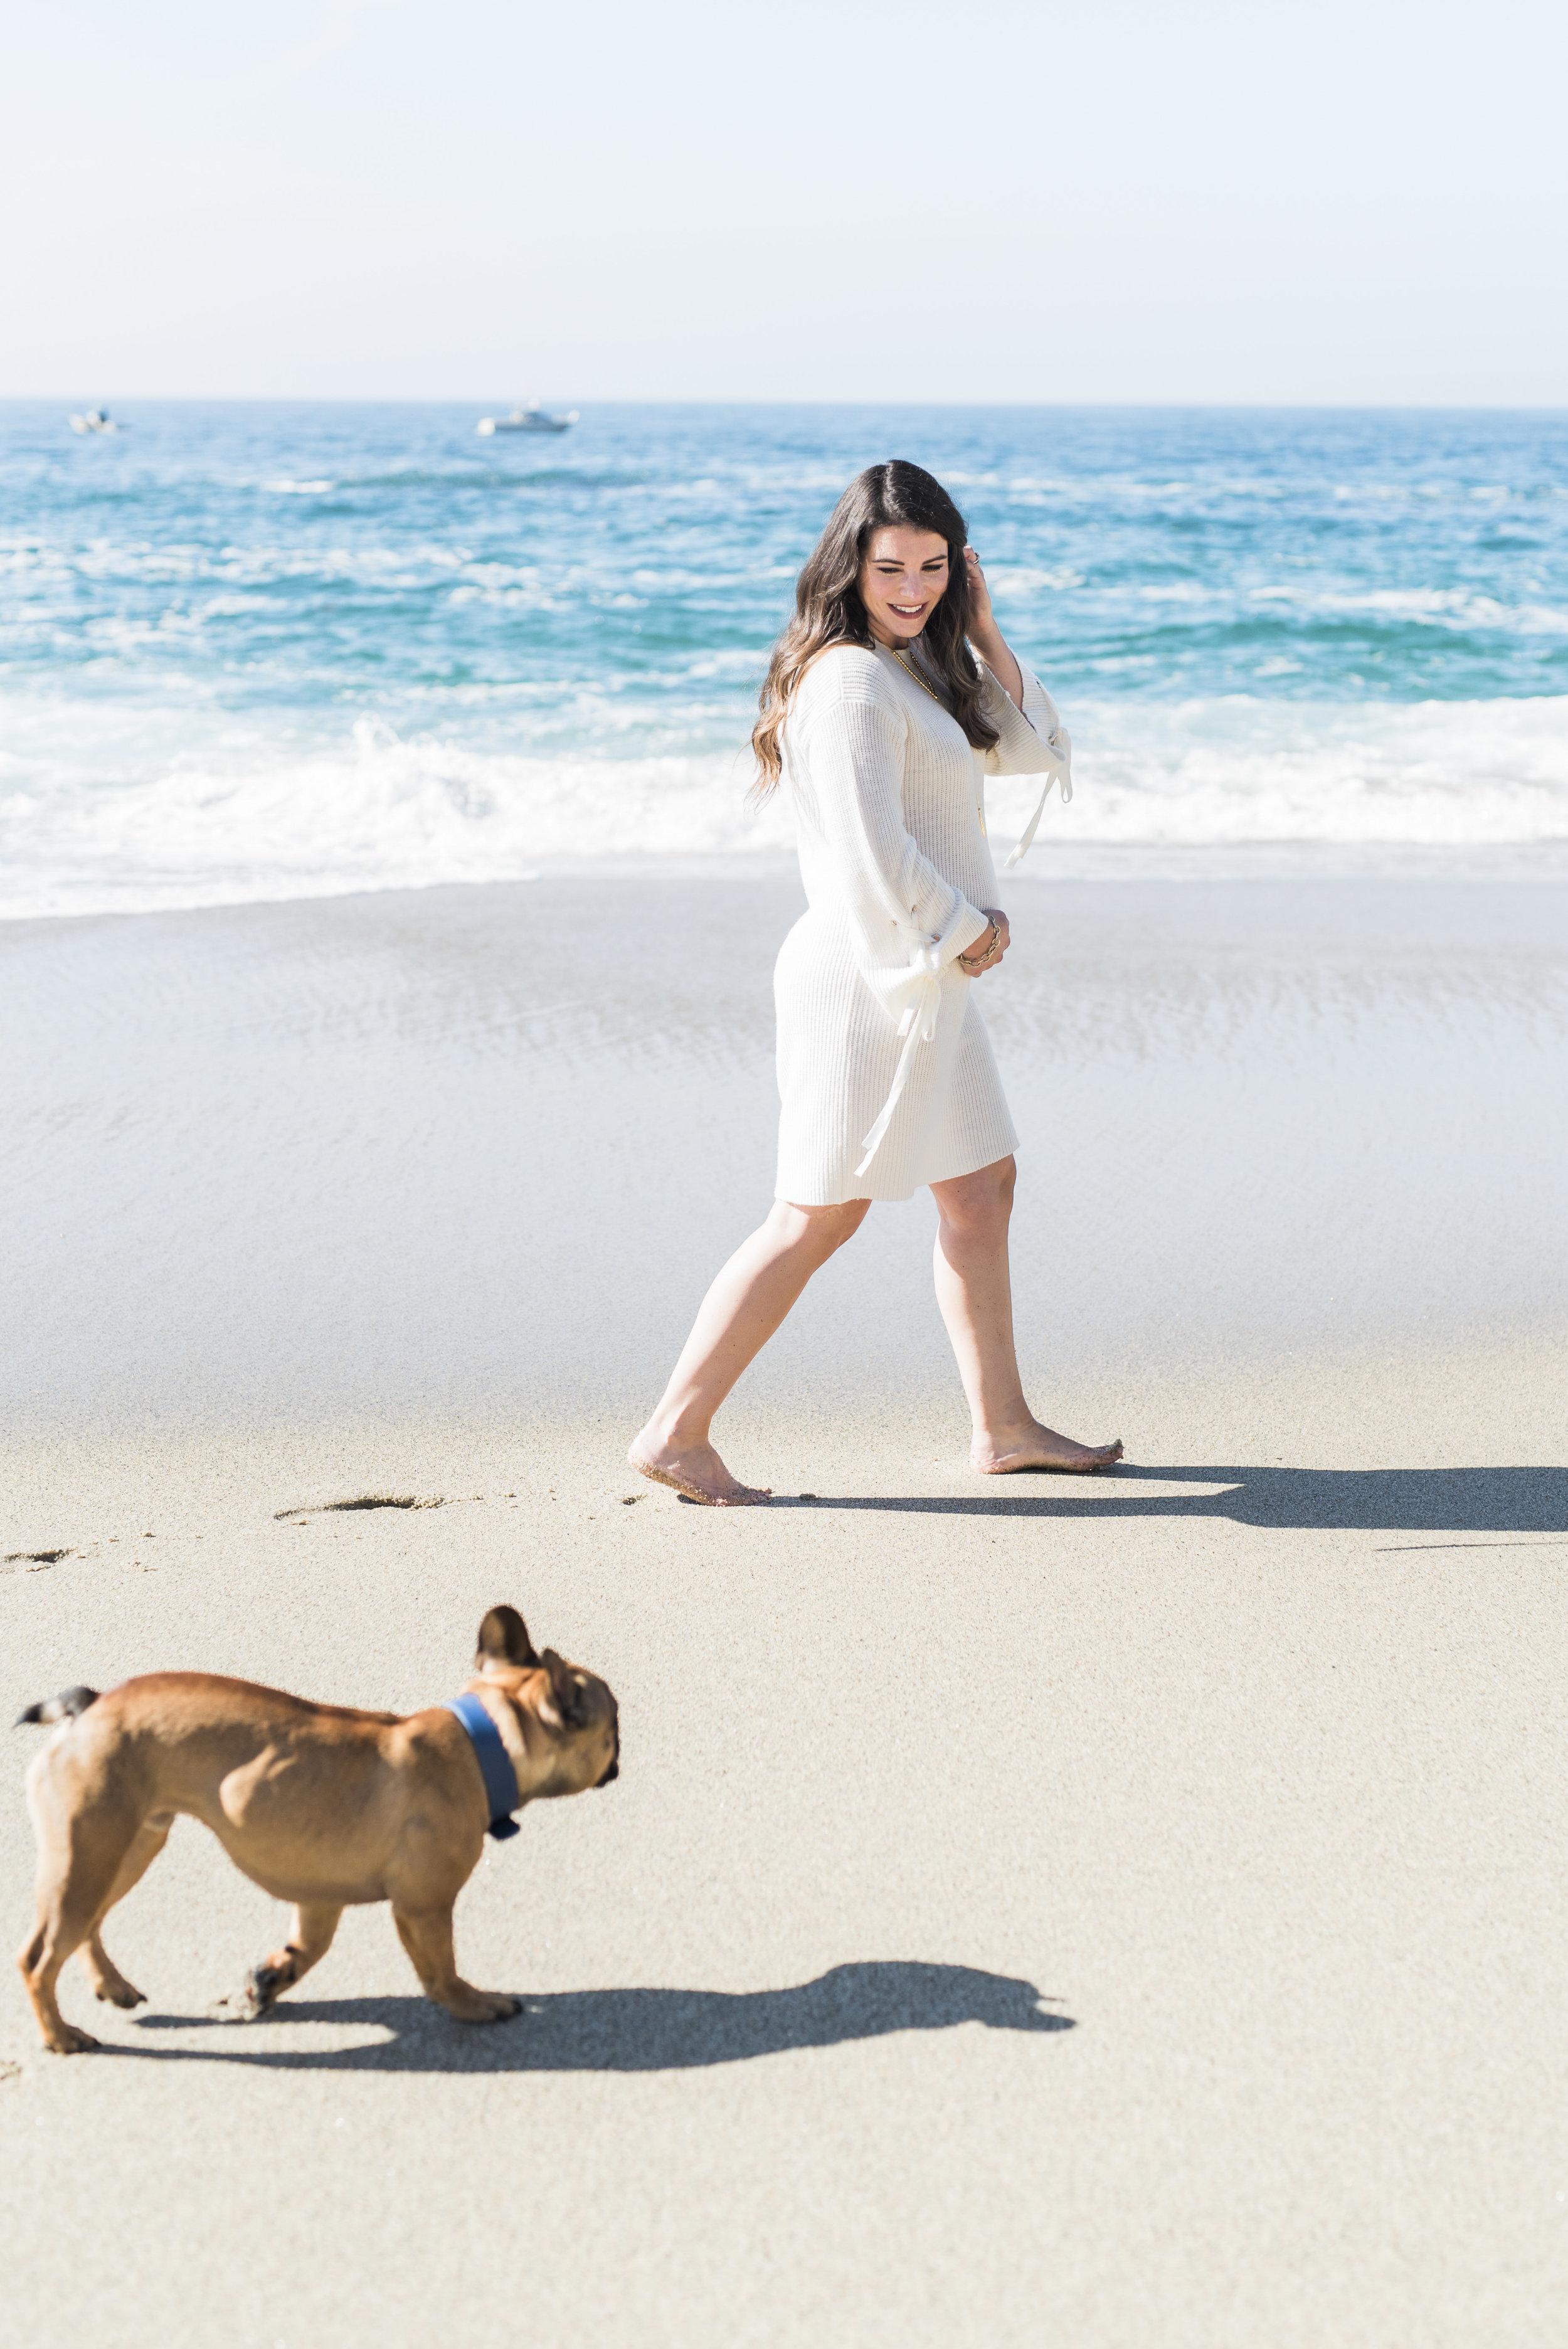 maternity photos on the beach_french bulldog_christmas photos neutral white outfits_01.jpg